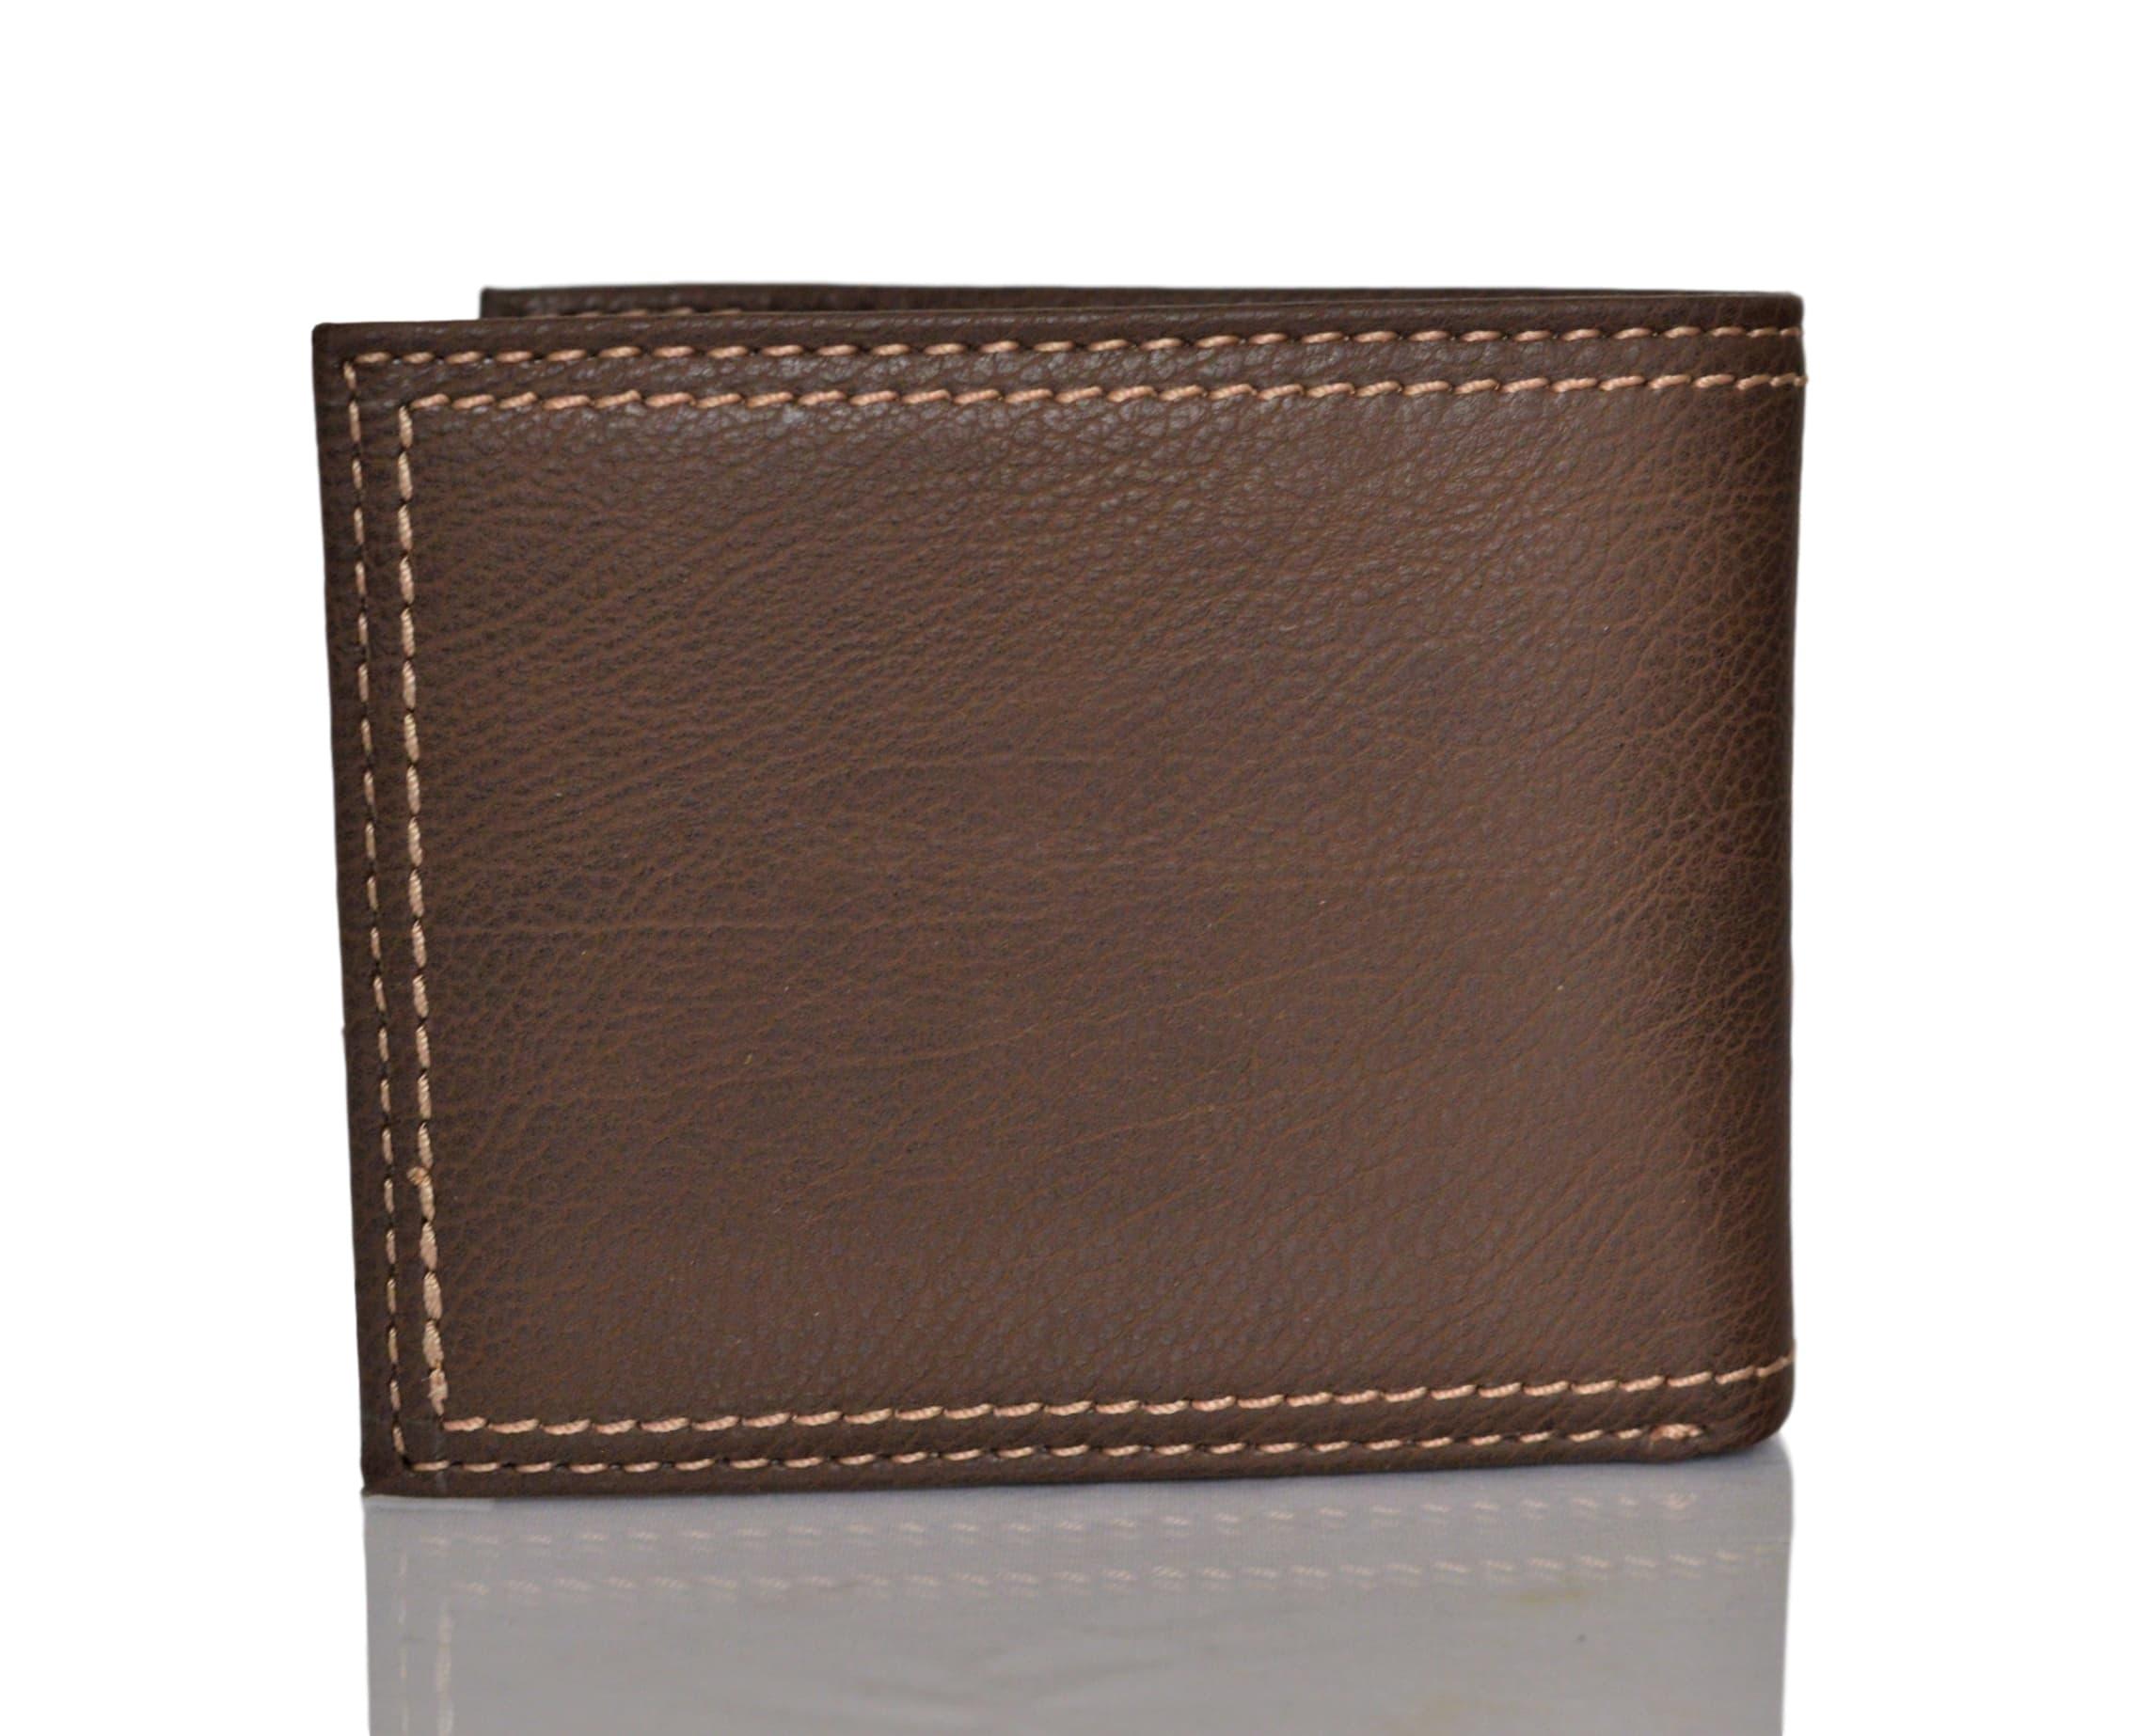 Levi-039-s-X-Capacity-Slim-Men-039-s-Bifold-Leather-Wallet thumbnail 11